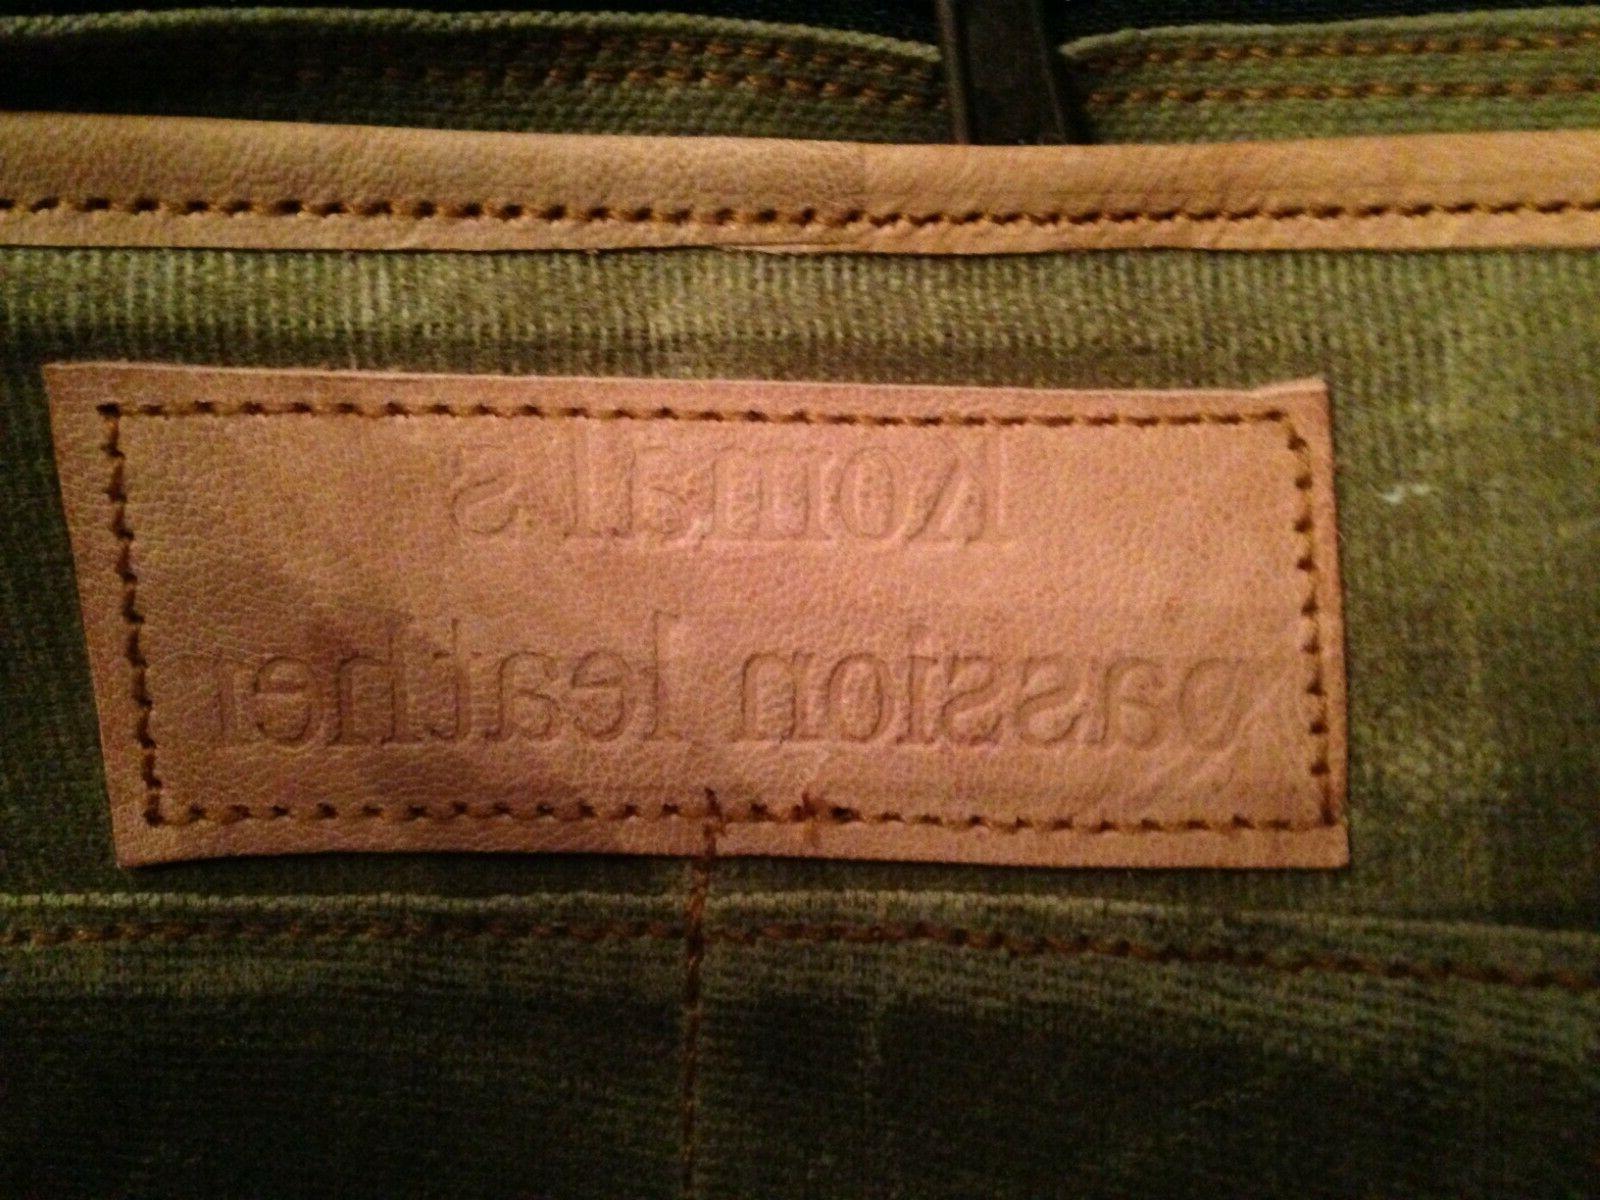 komal KPL Rustic Vintage Messenger Bag Satc